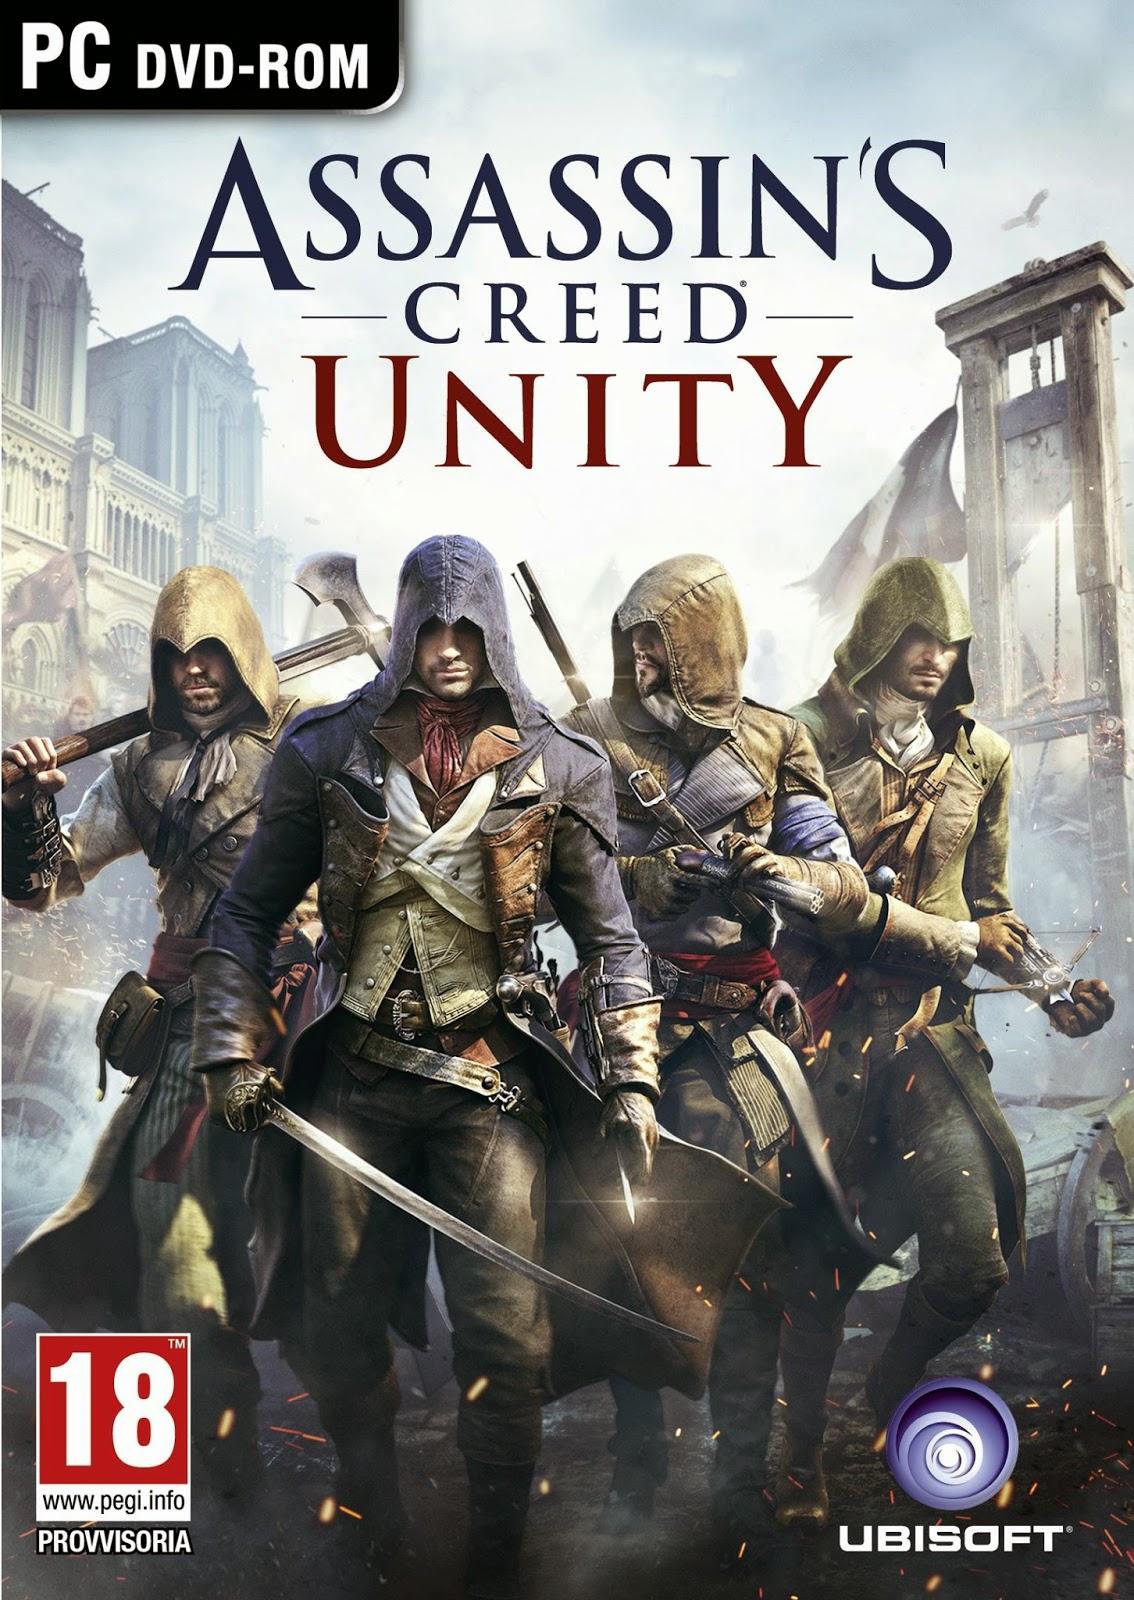 تحميل لعبة  Assassin's Creed Unity نسخة PC - تحميل مباشر